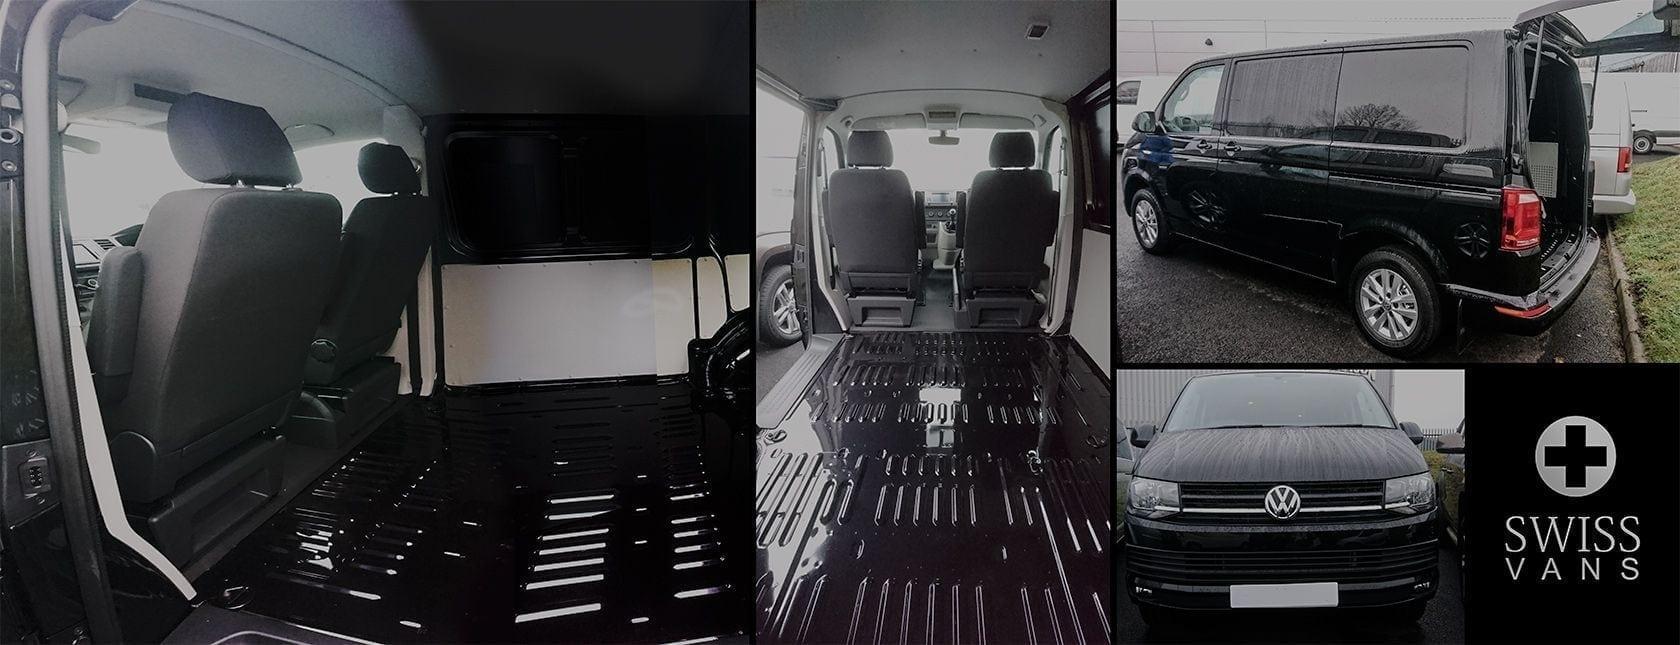 Campervan Conversion Project 2017 Weve Got The Perfect Van